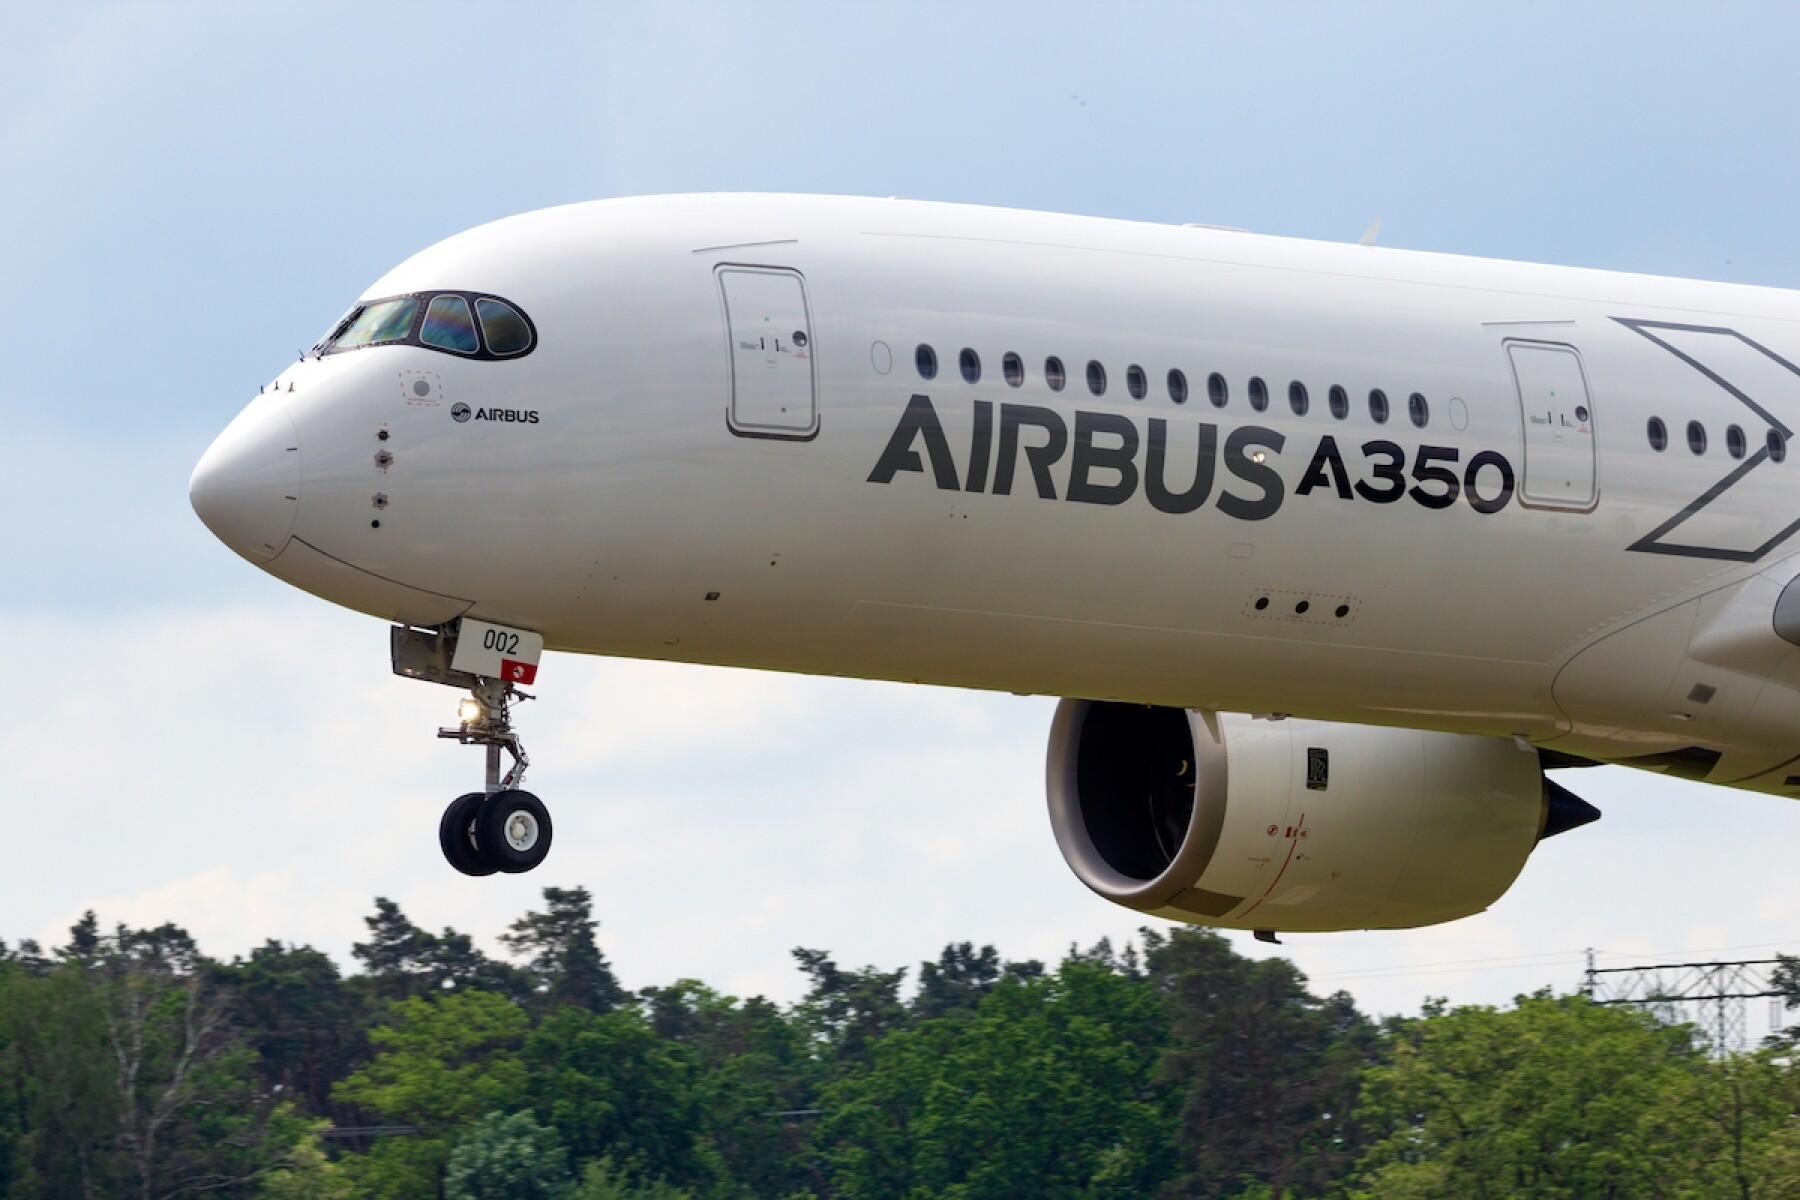 Airbus A350 XWB passenger plane